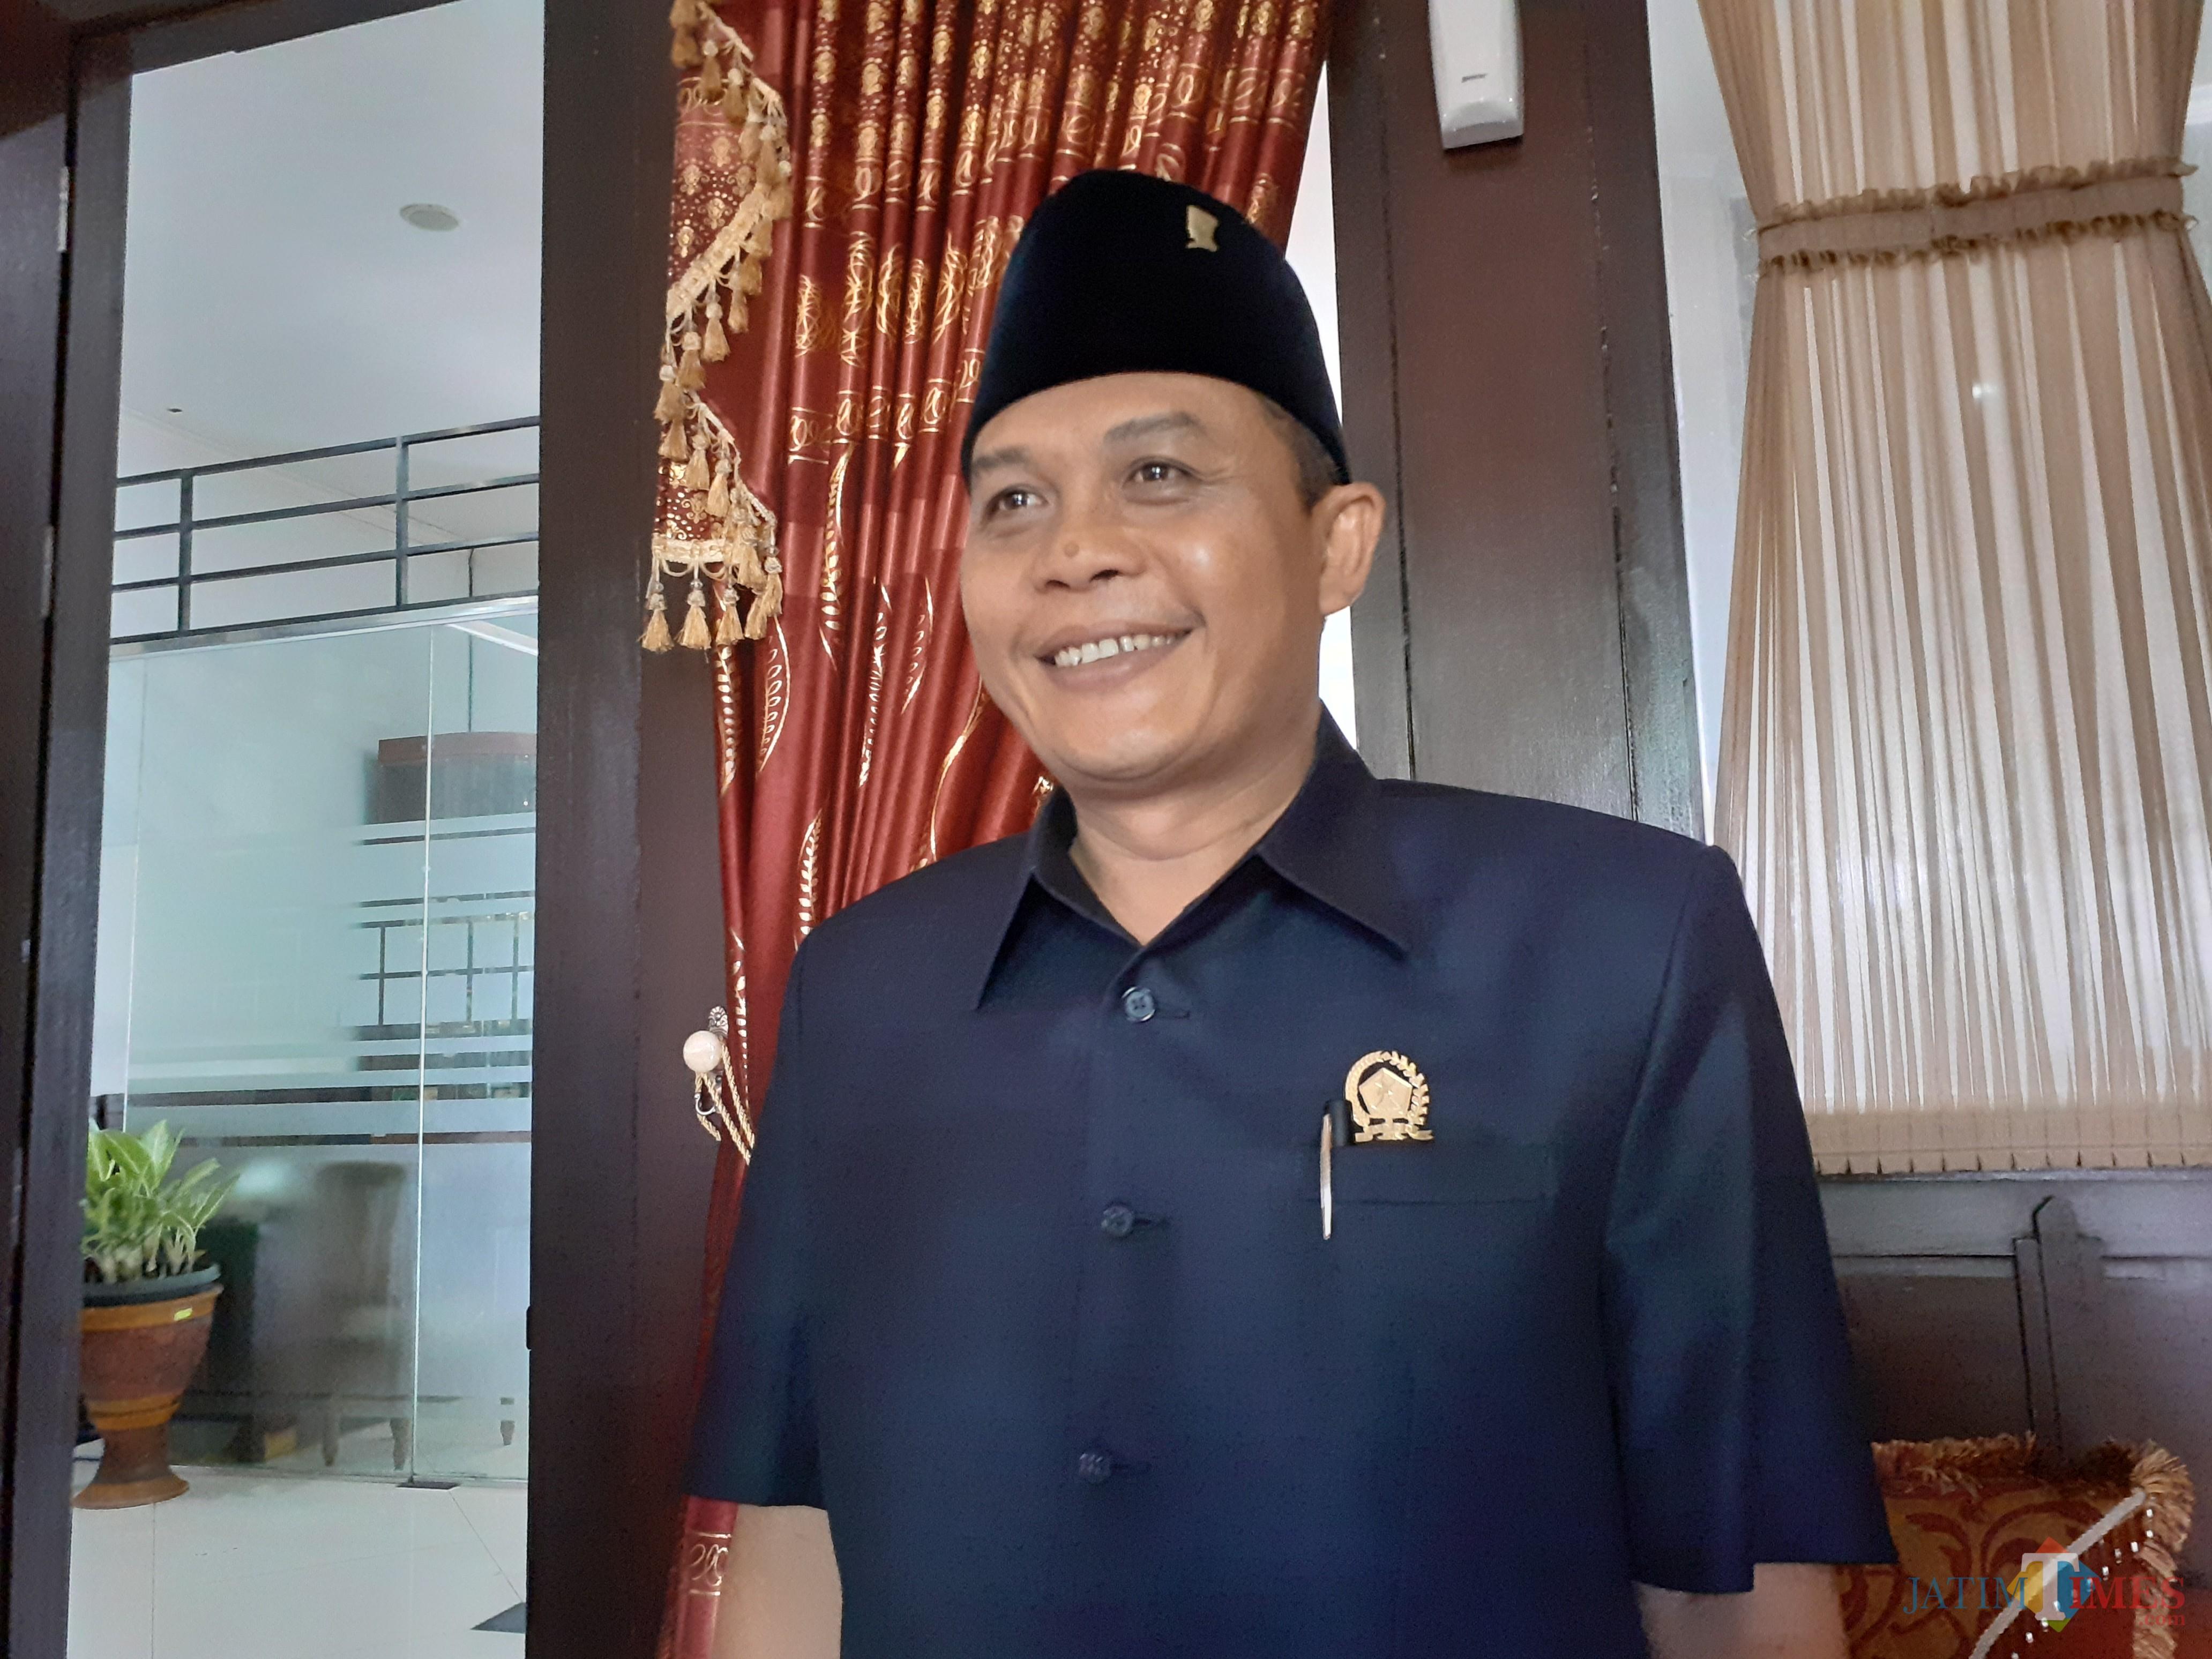 Ketua DPRD Kota Malang I Made Riandiana Kartika (Arifina Cahyanti Firdausi/MalangTIMES)